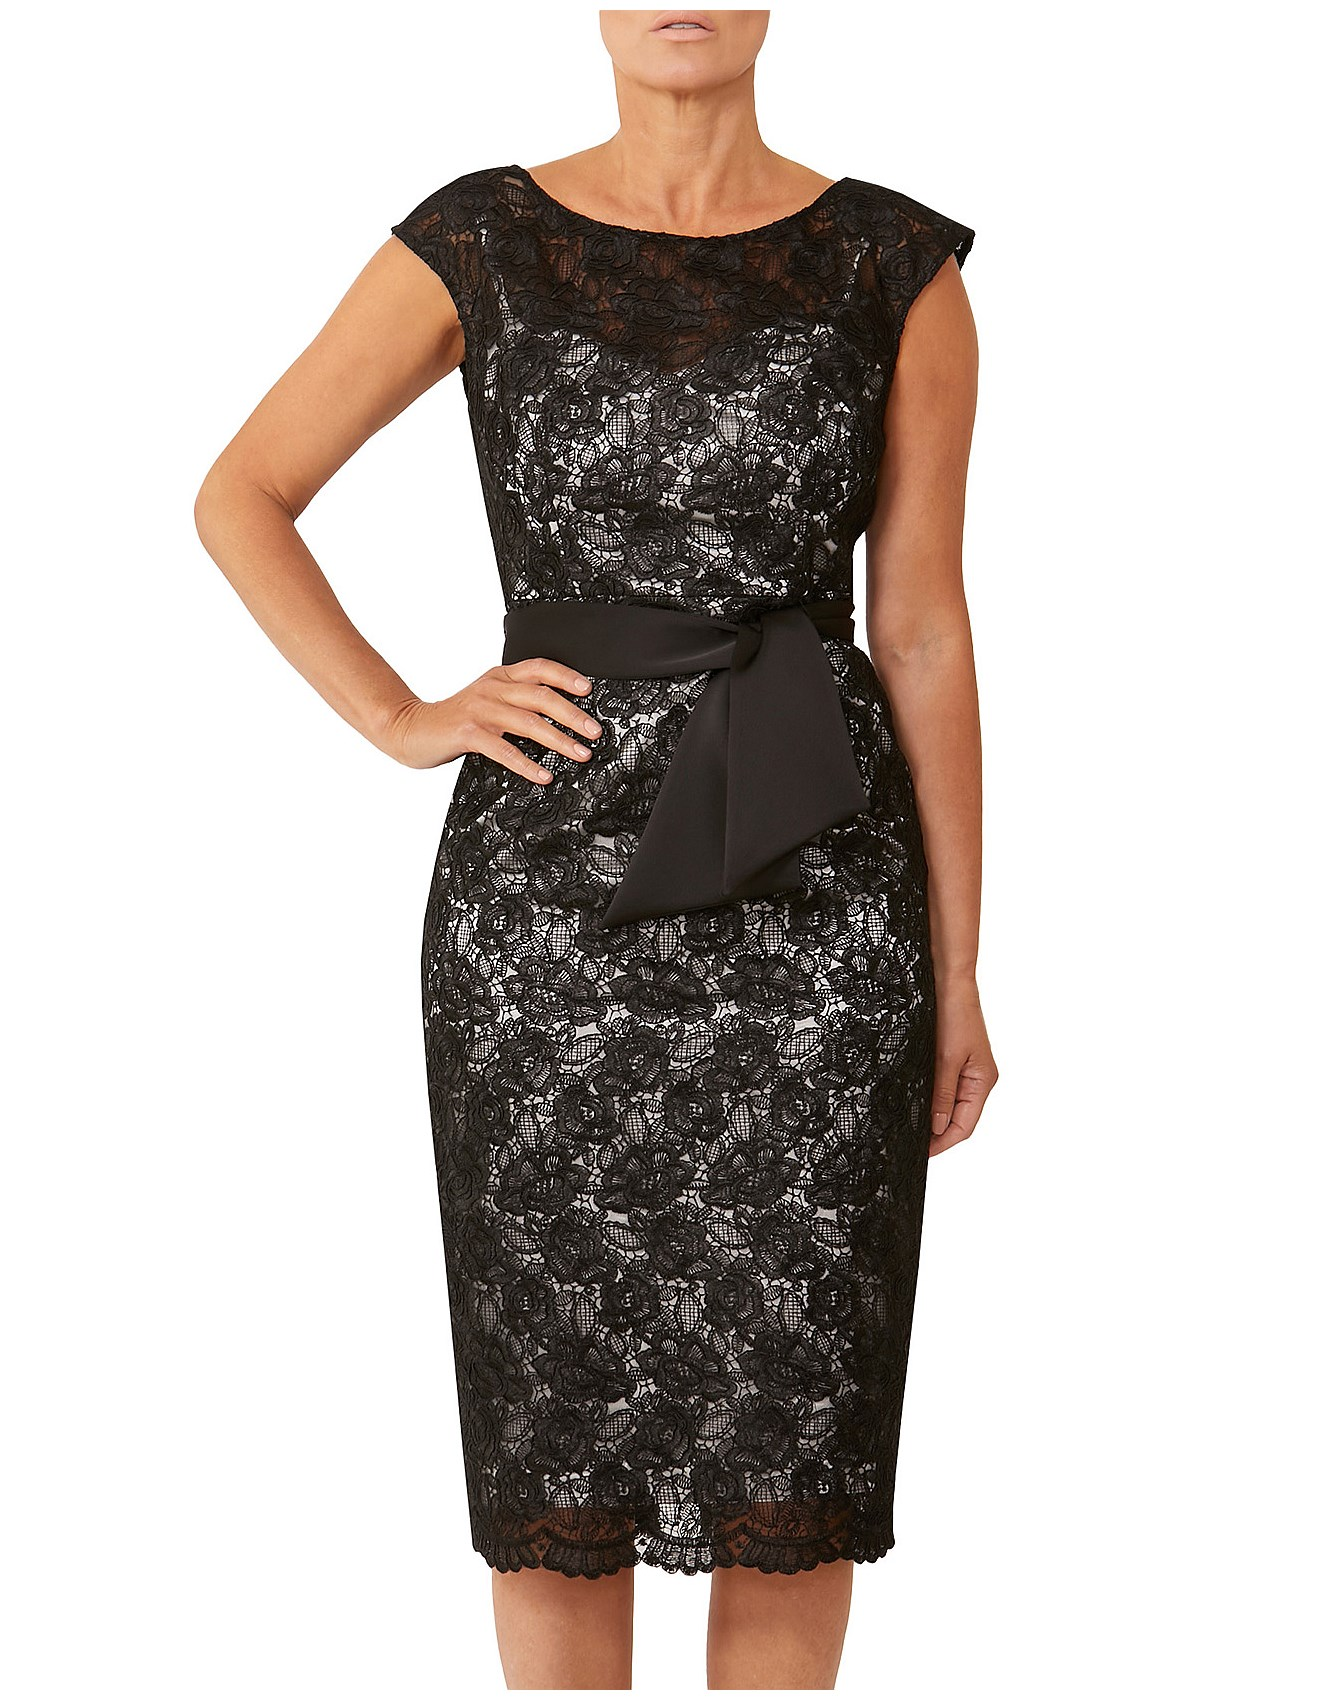 anthea crawford dresses,anthea crawford dresses,